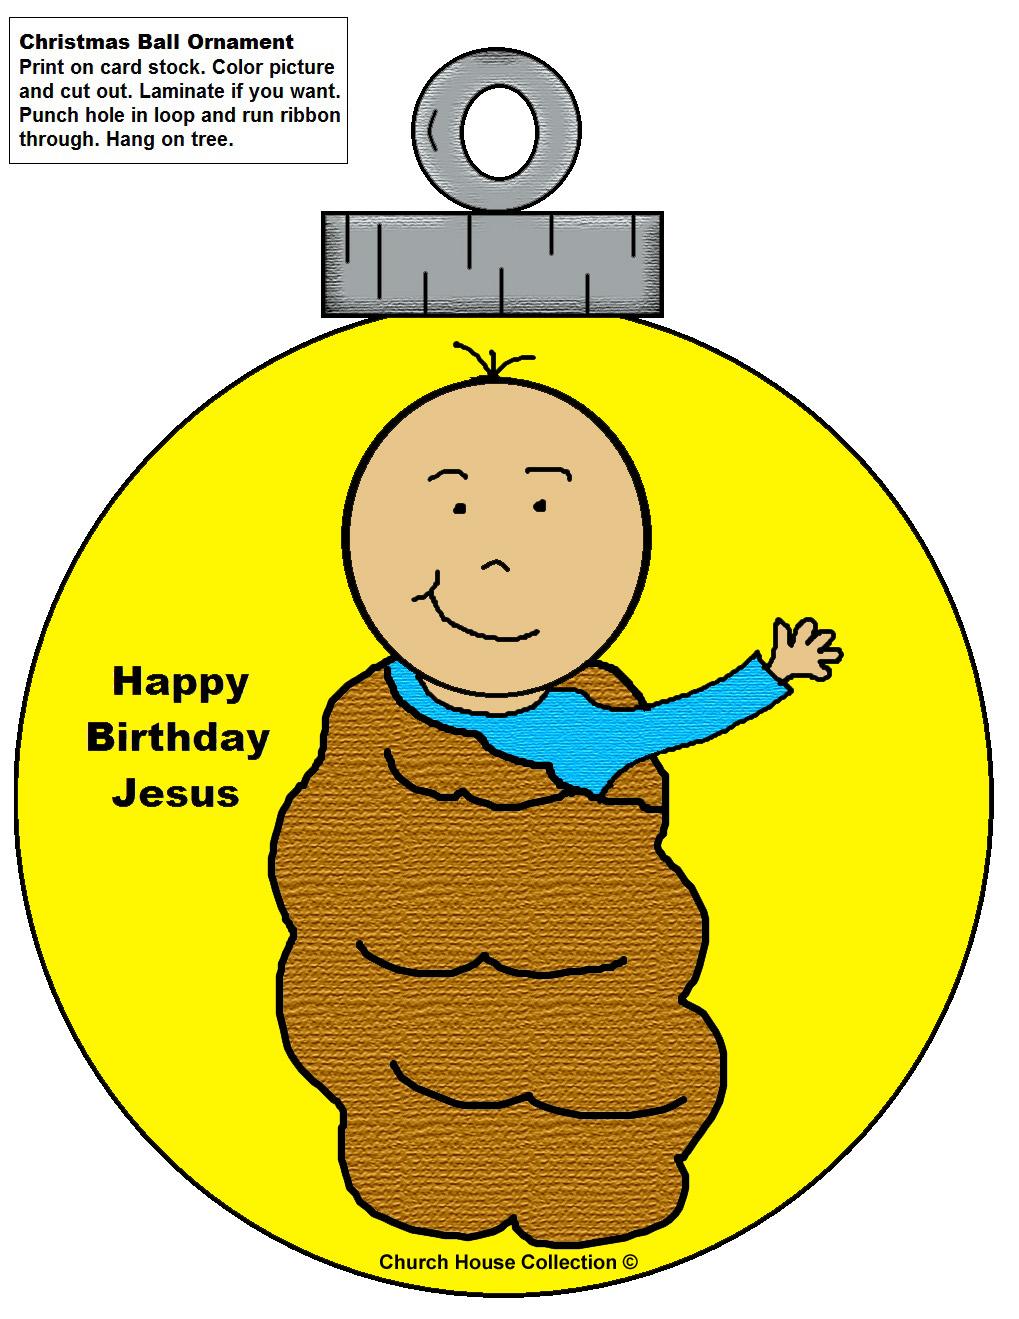 Happy Birthday Jesus Clipart Free Image Download